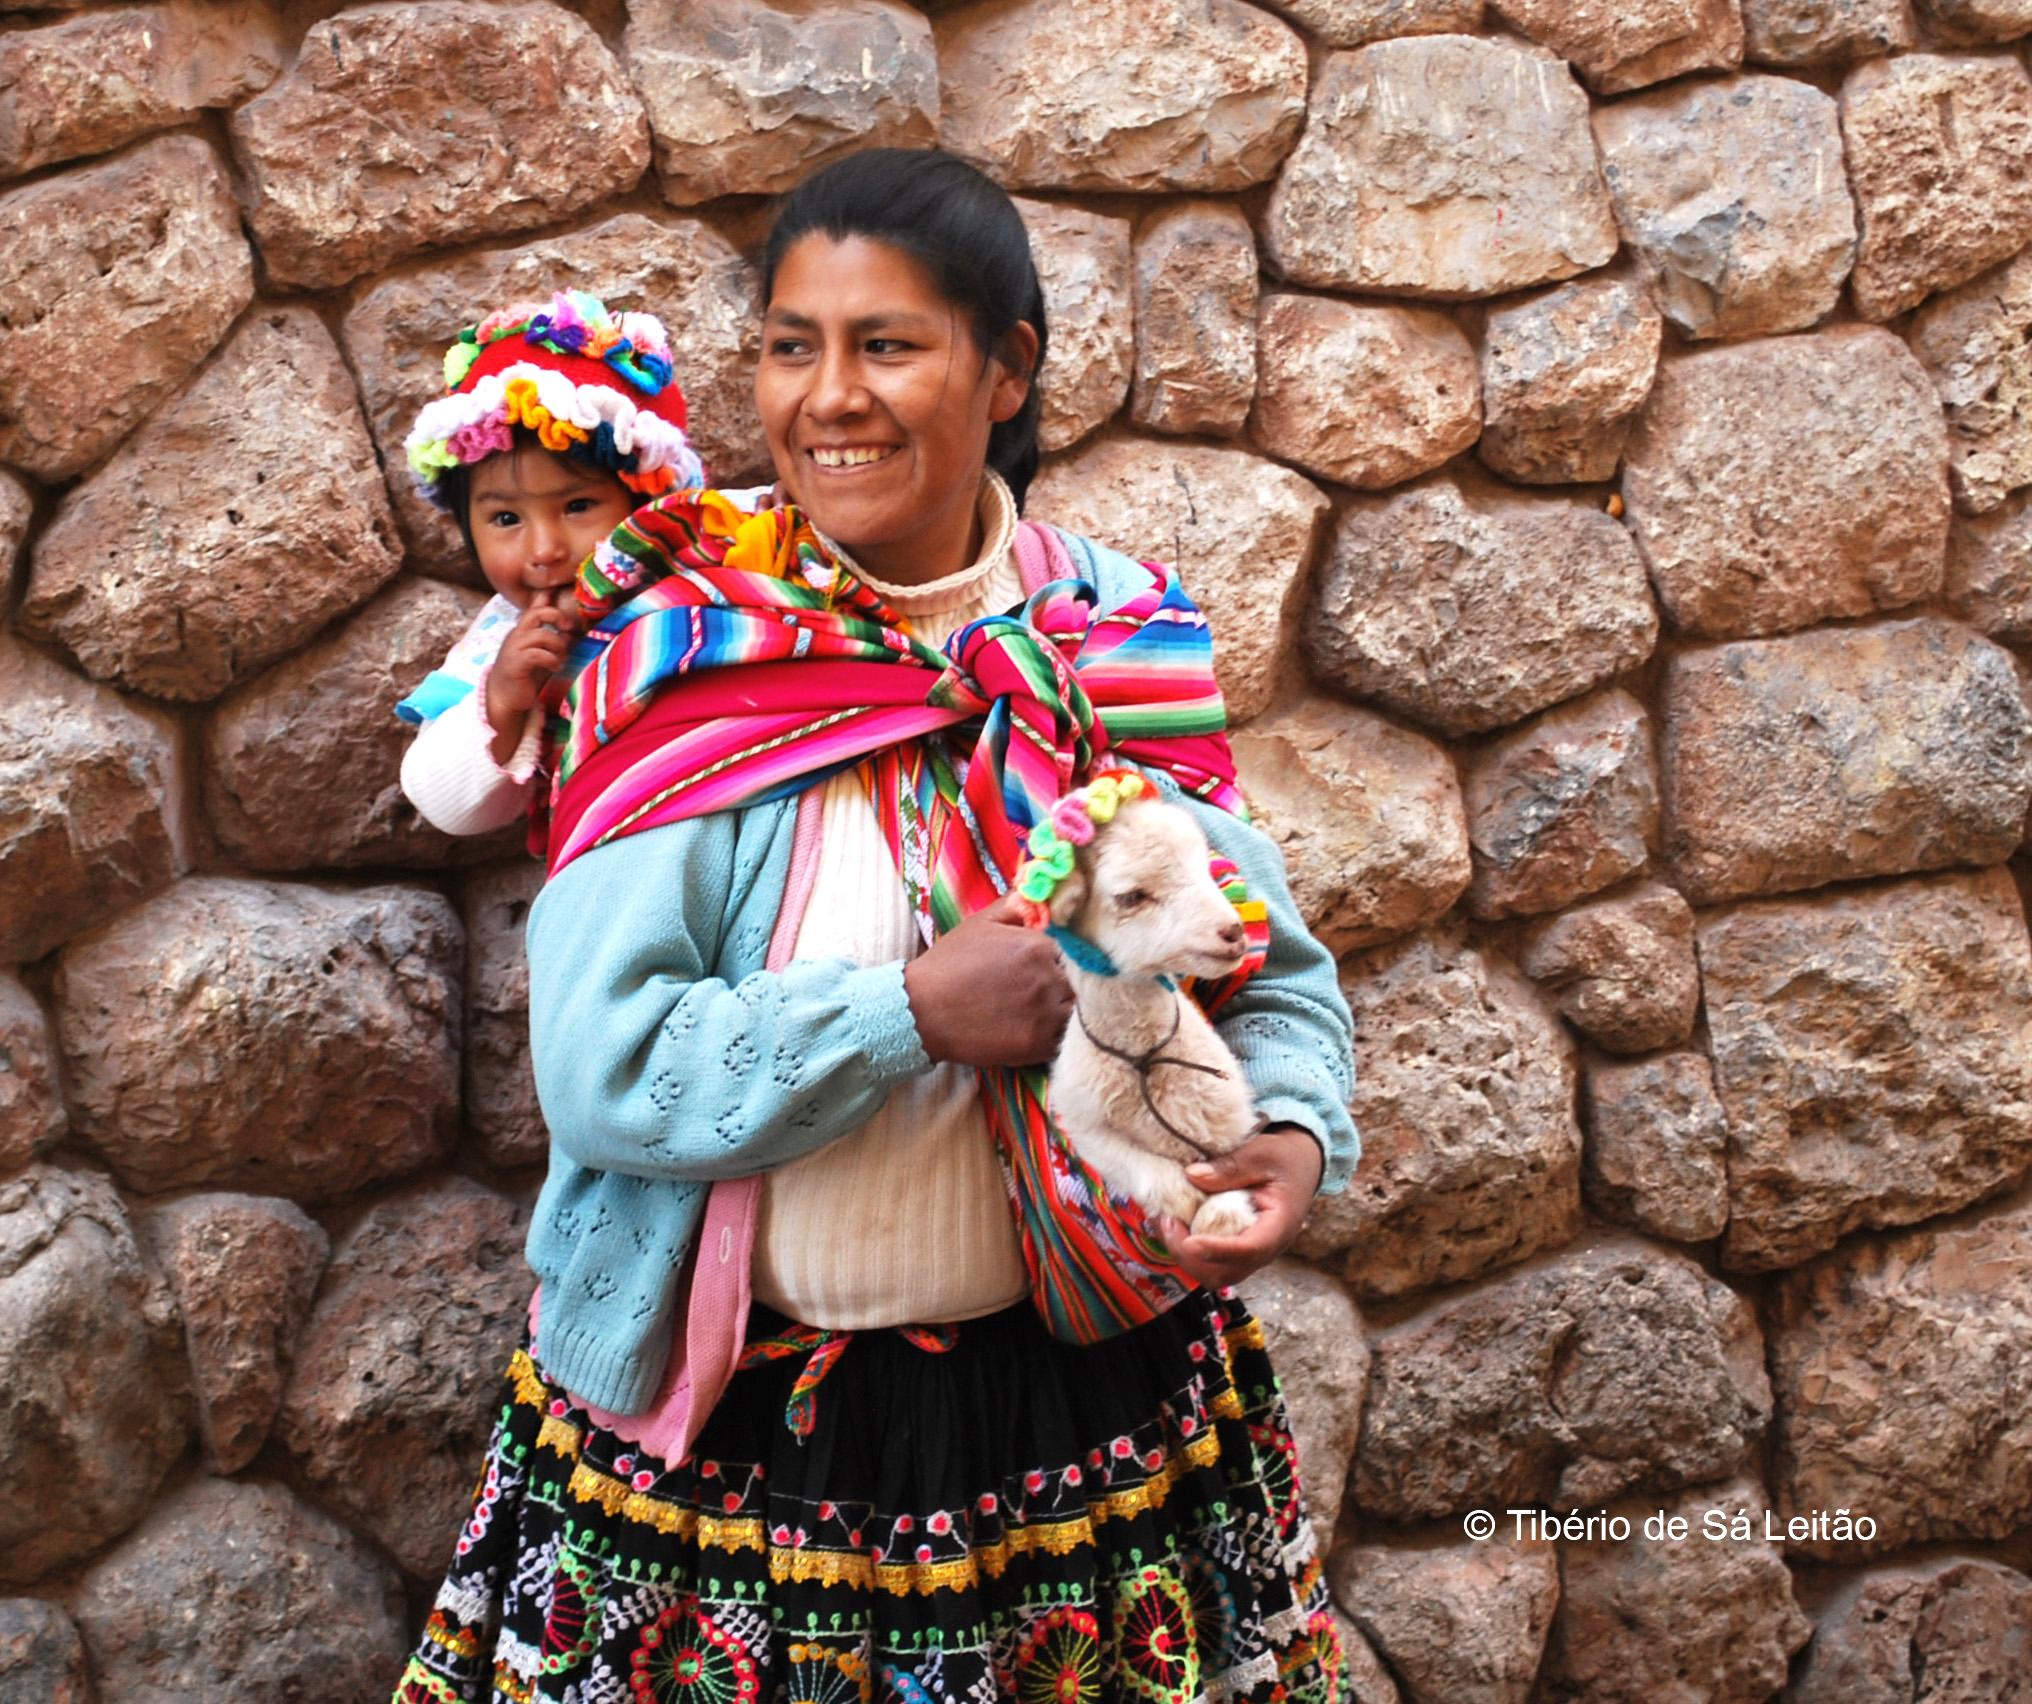 Santo Verbo – Pachamama ou Mãe Terra, Deusa do Legado Andino